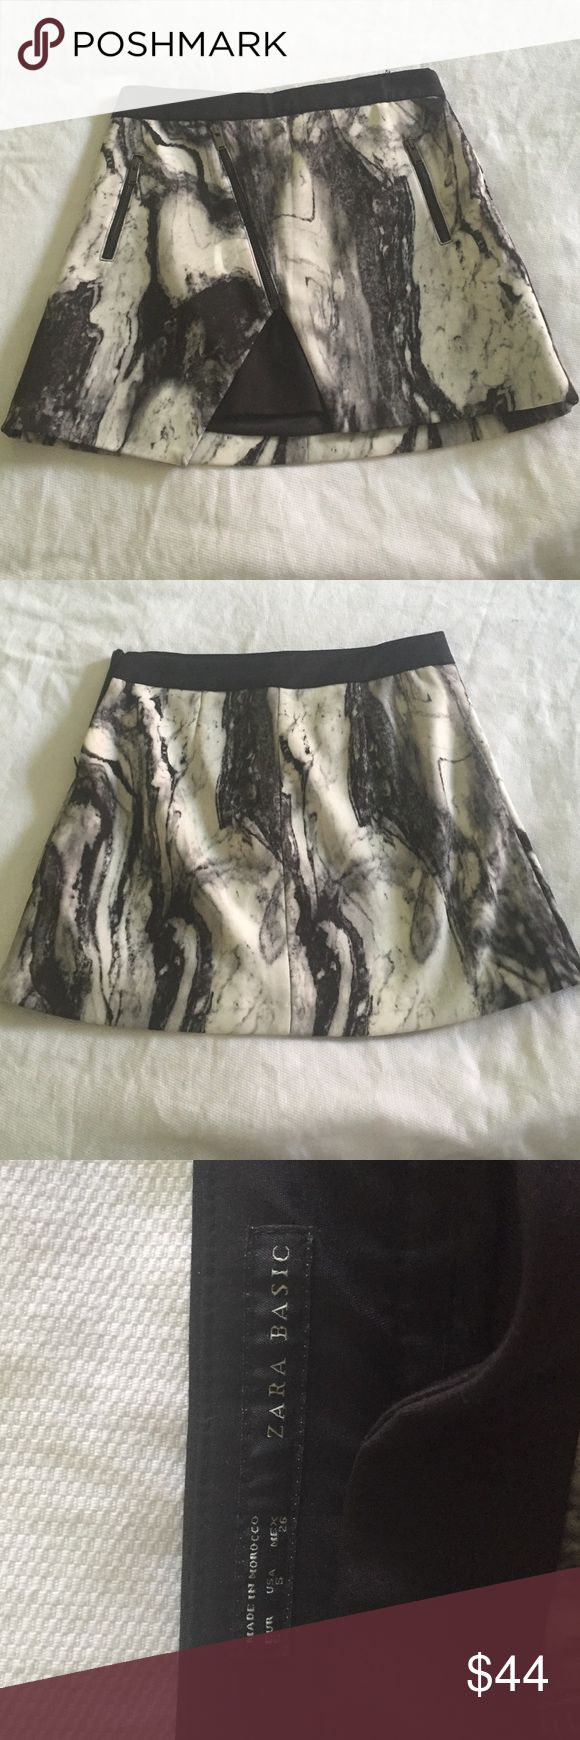 RARE Zara skirt small Never worn RARE black and white marble print Zara skirt, size small Zara Skirts Mini